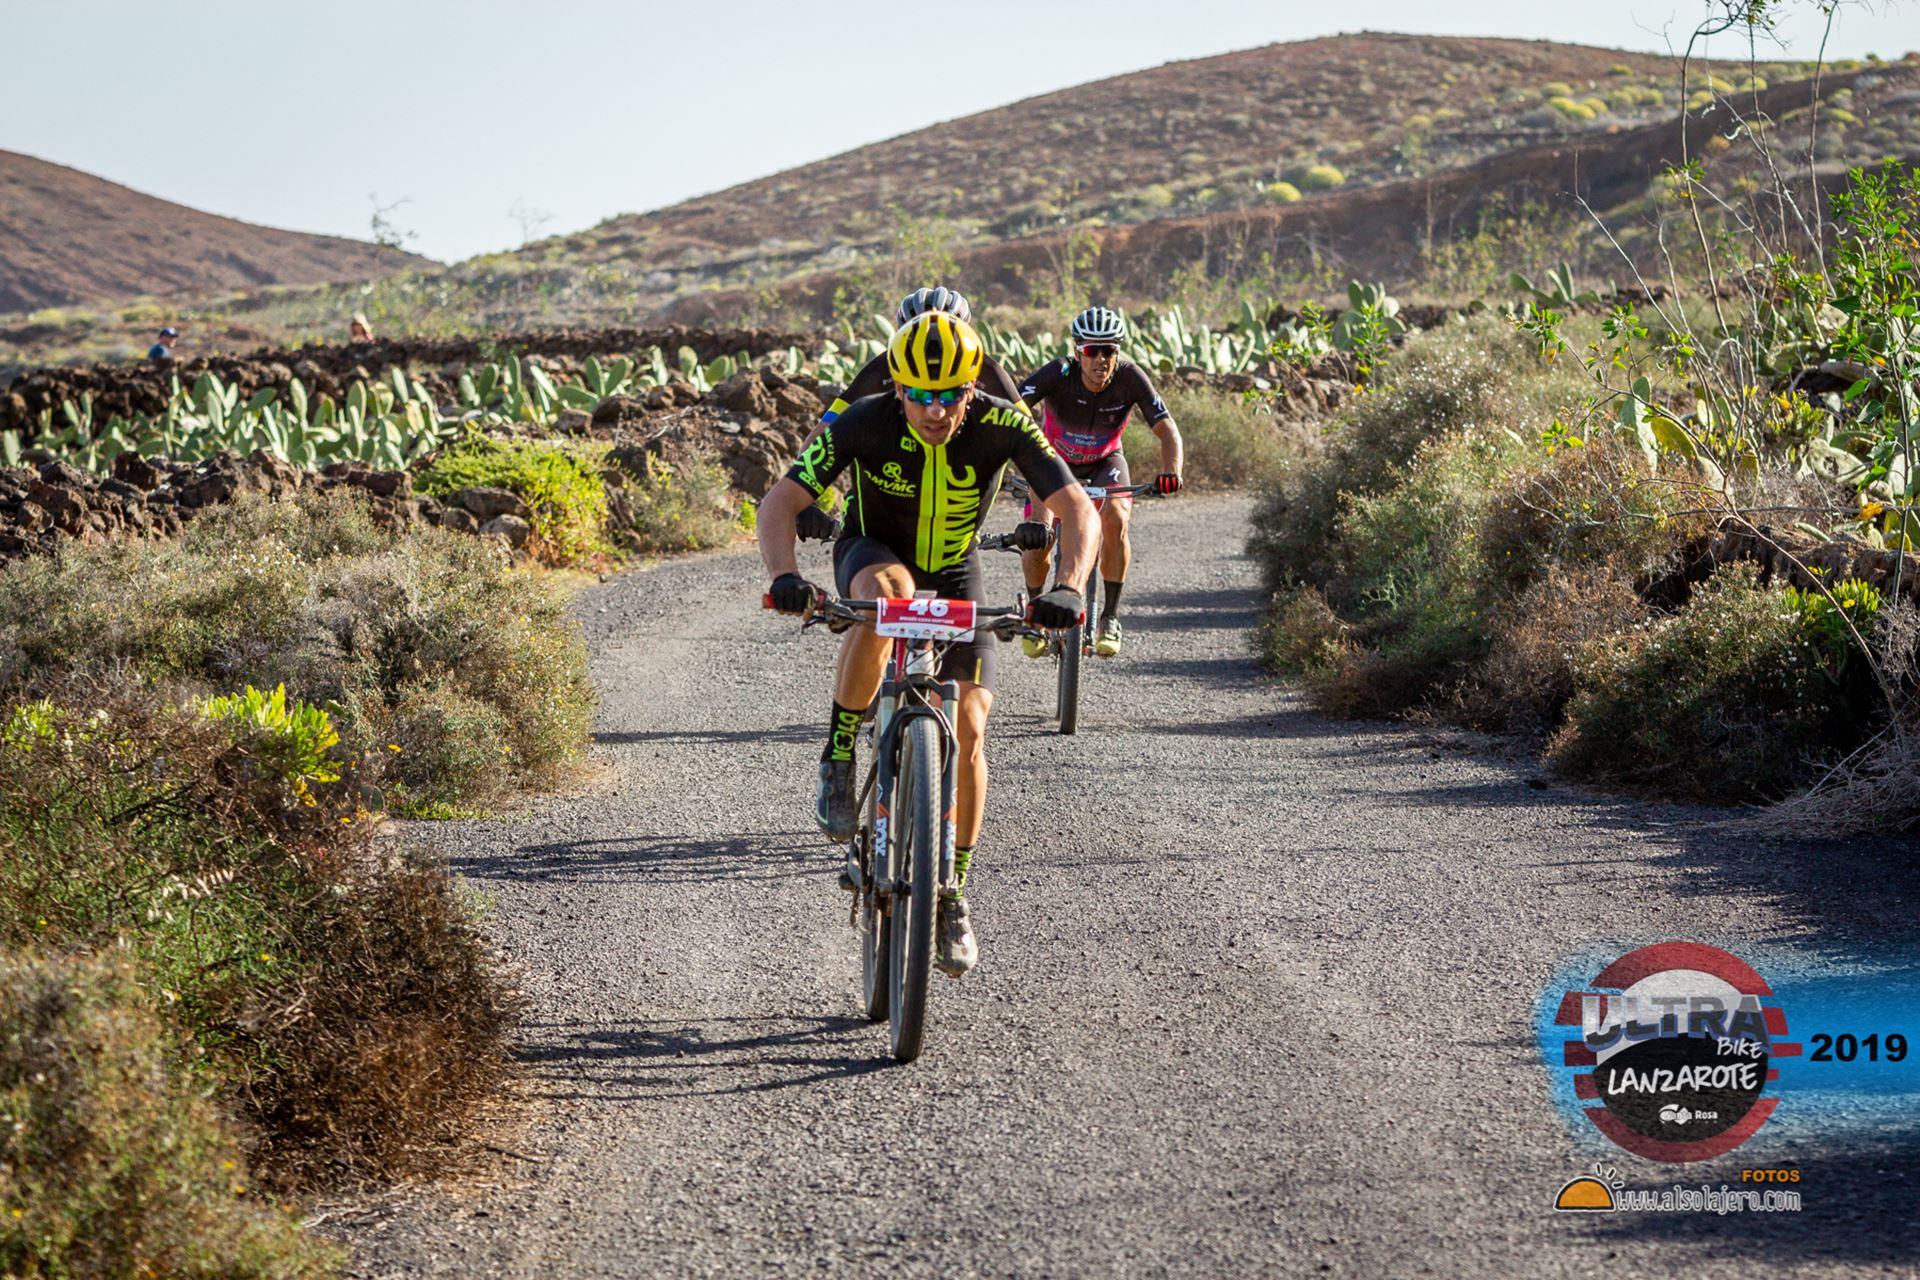 Sector Guatiza 2ª Etapa Ultrabike 2019 Fotos Alsolajero.com-5